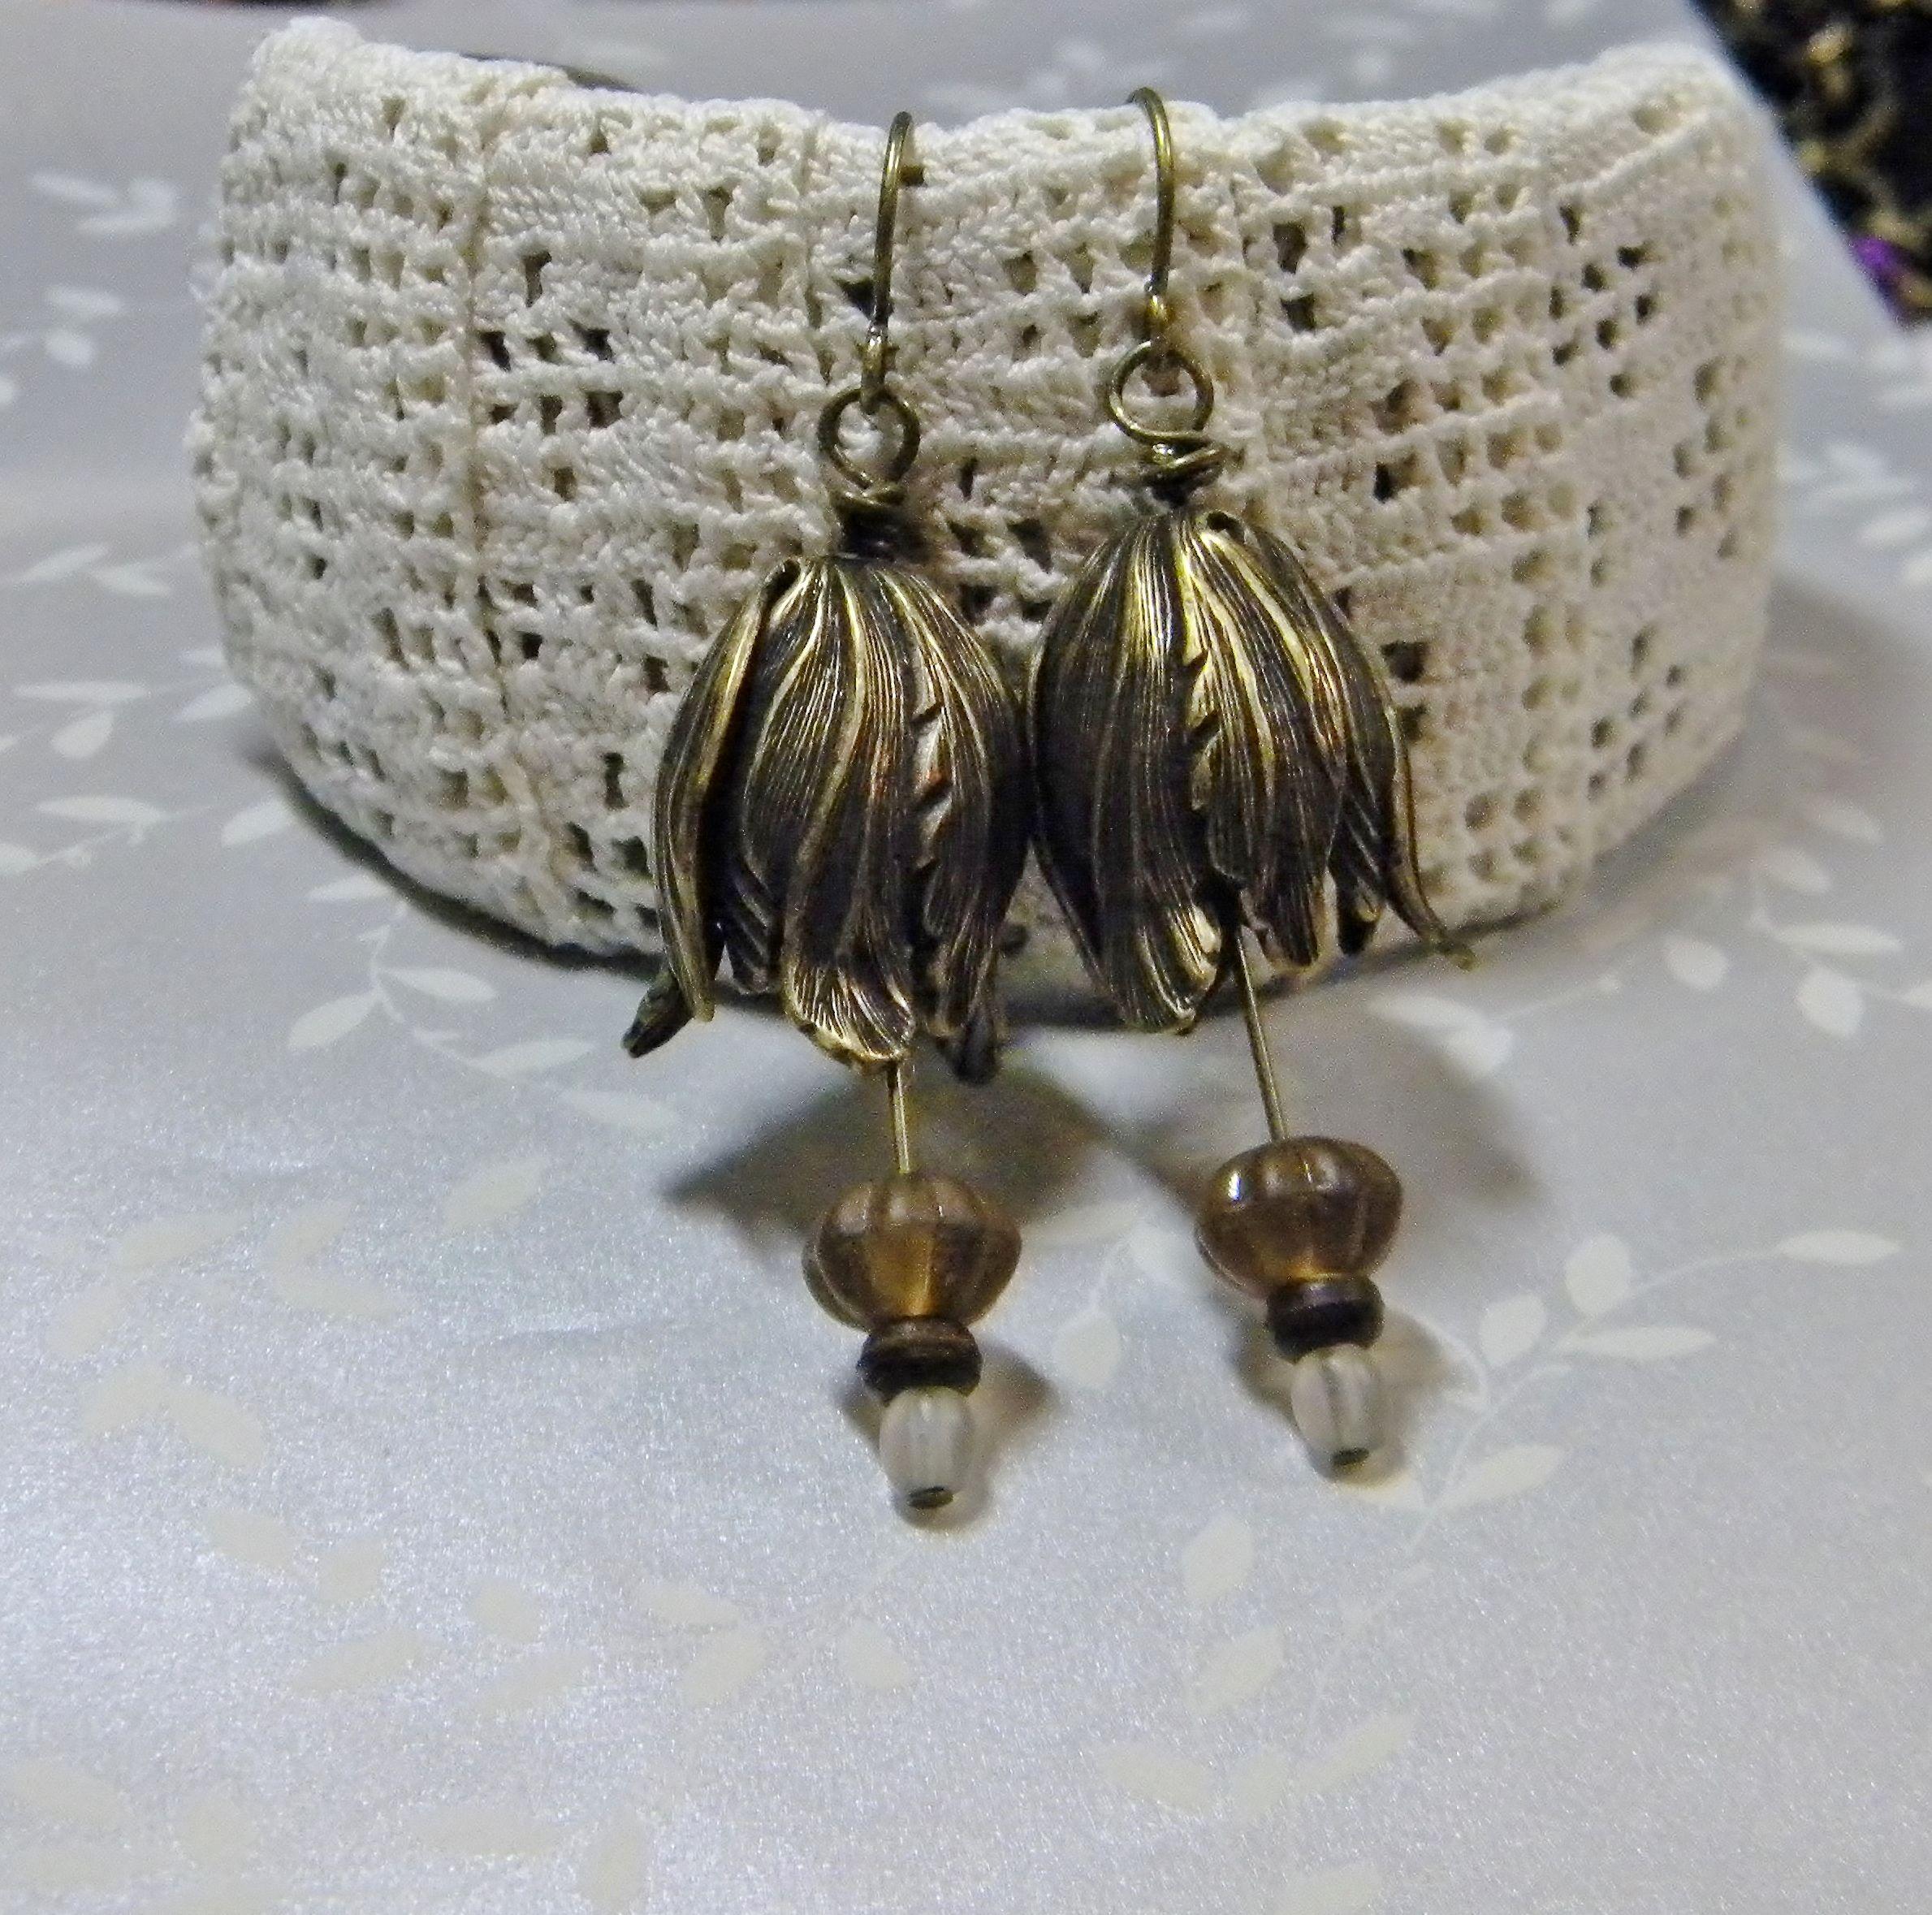 Some simple Sunday earrings - Amy Jorgensen - Ameme Designs